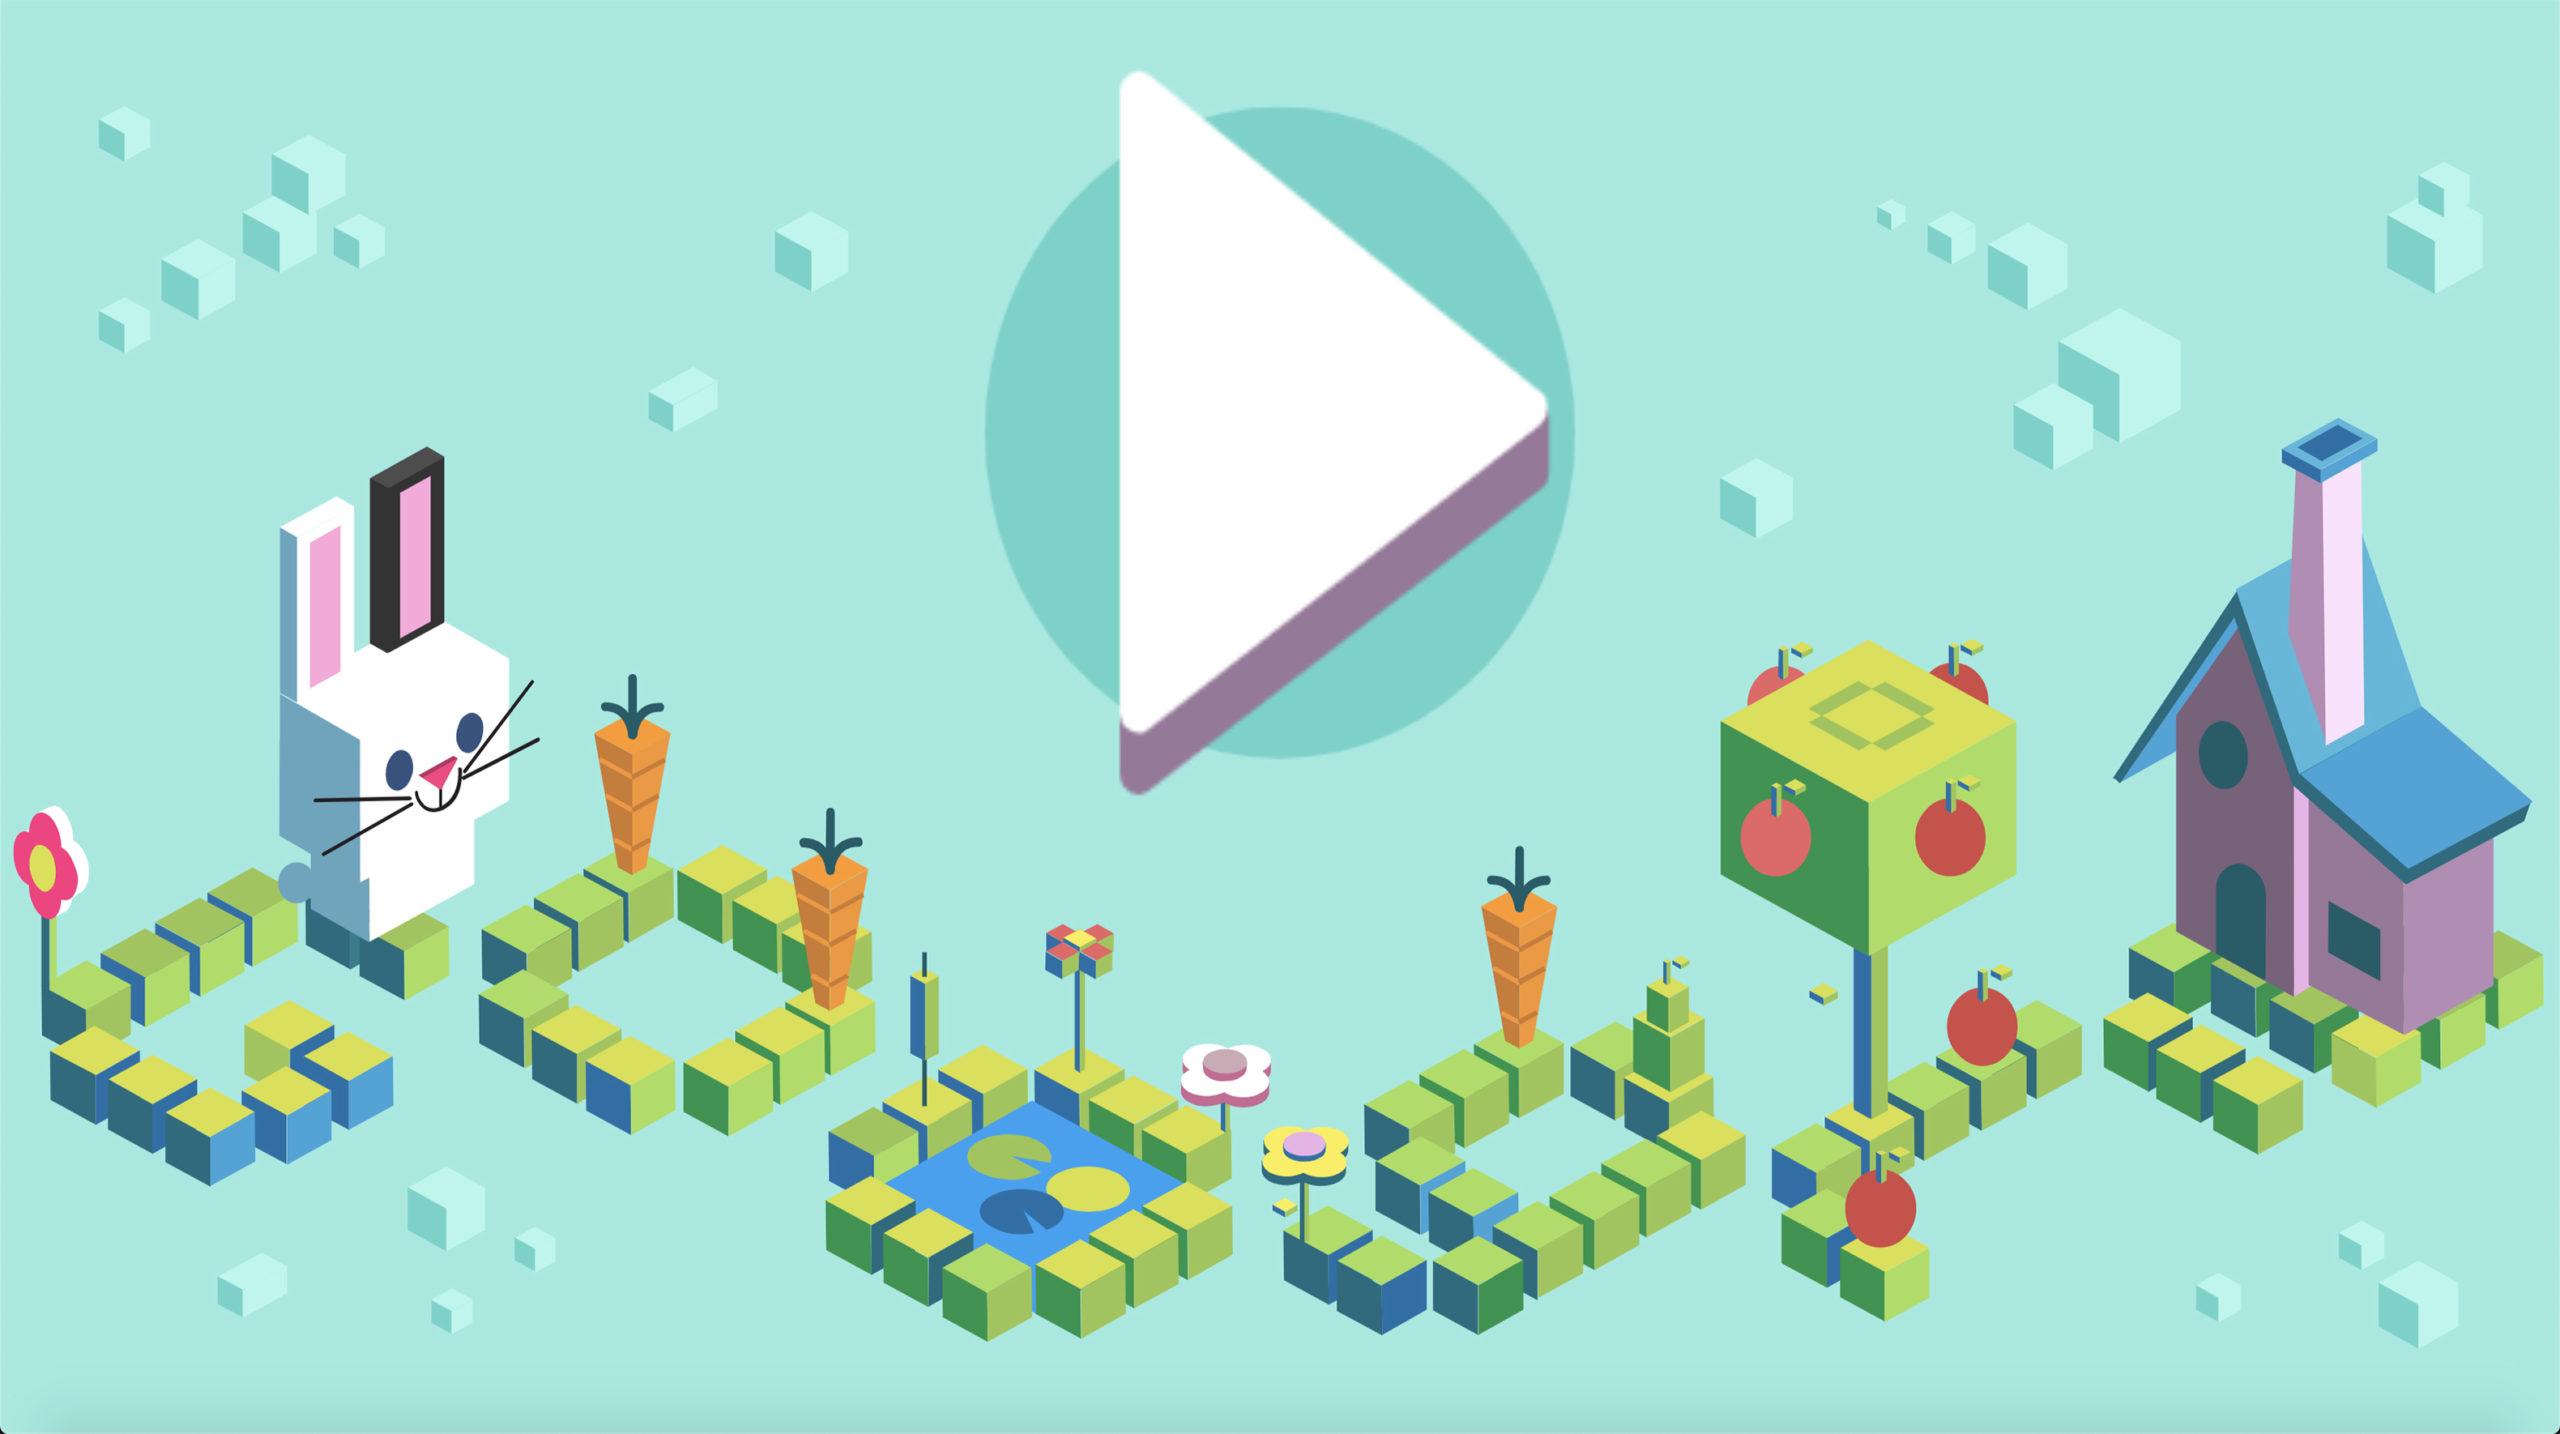 Google Doodles Is Bringing Back Its Most Popular Games